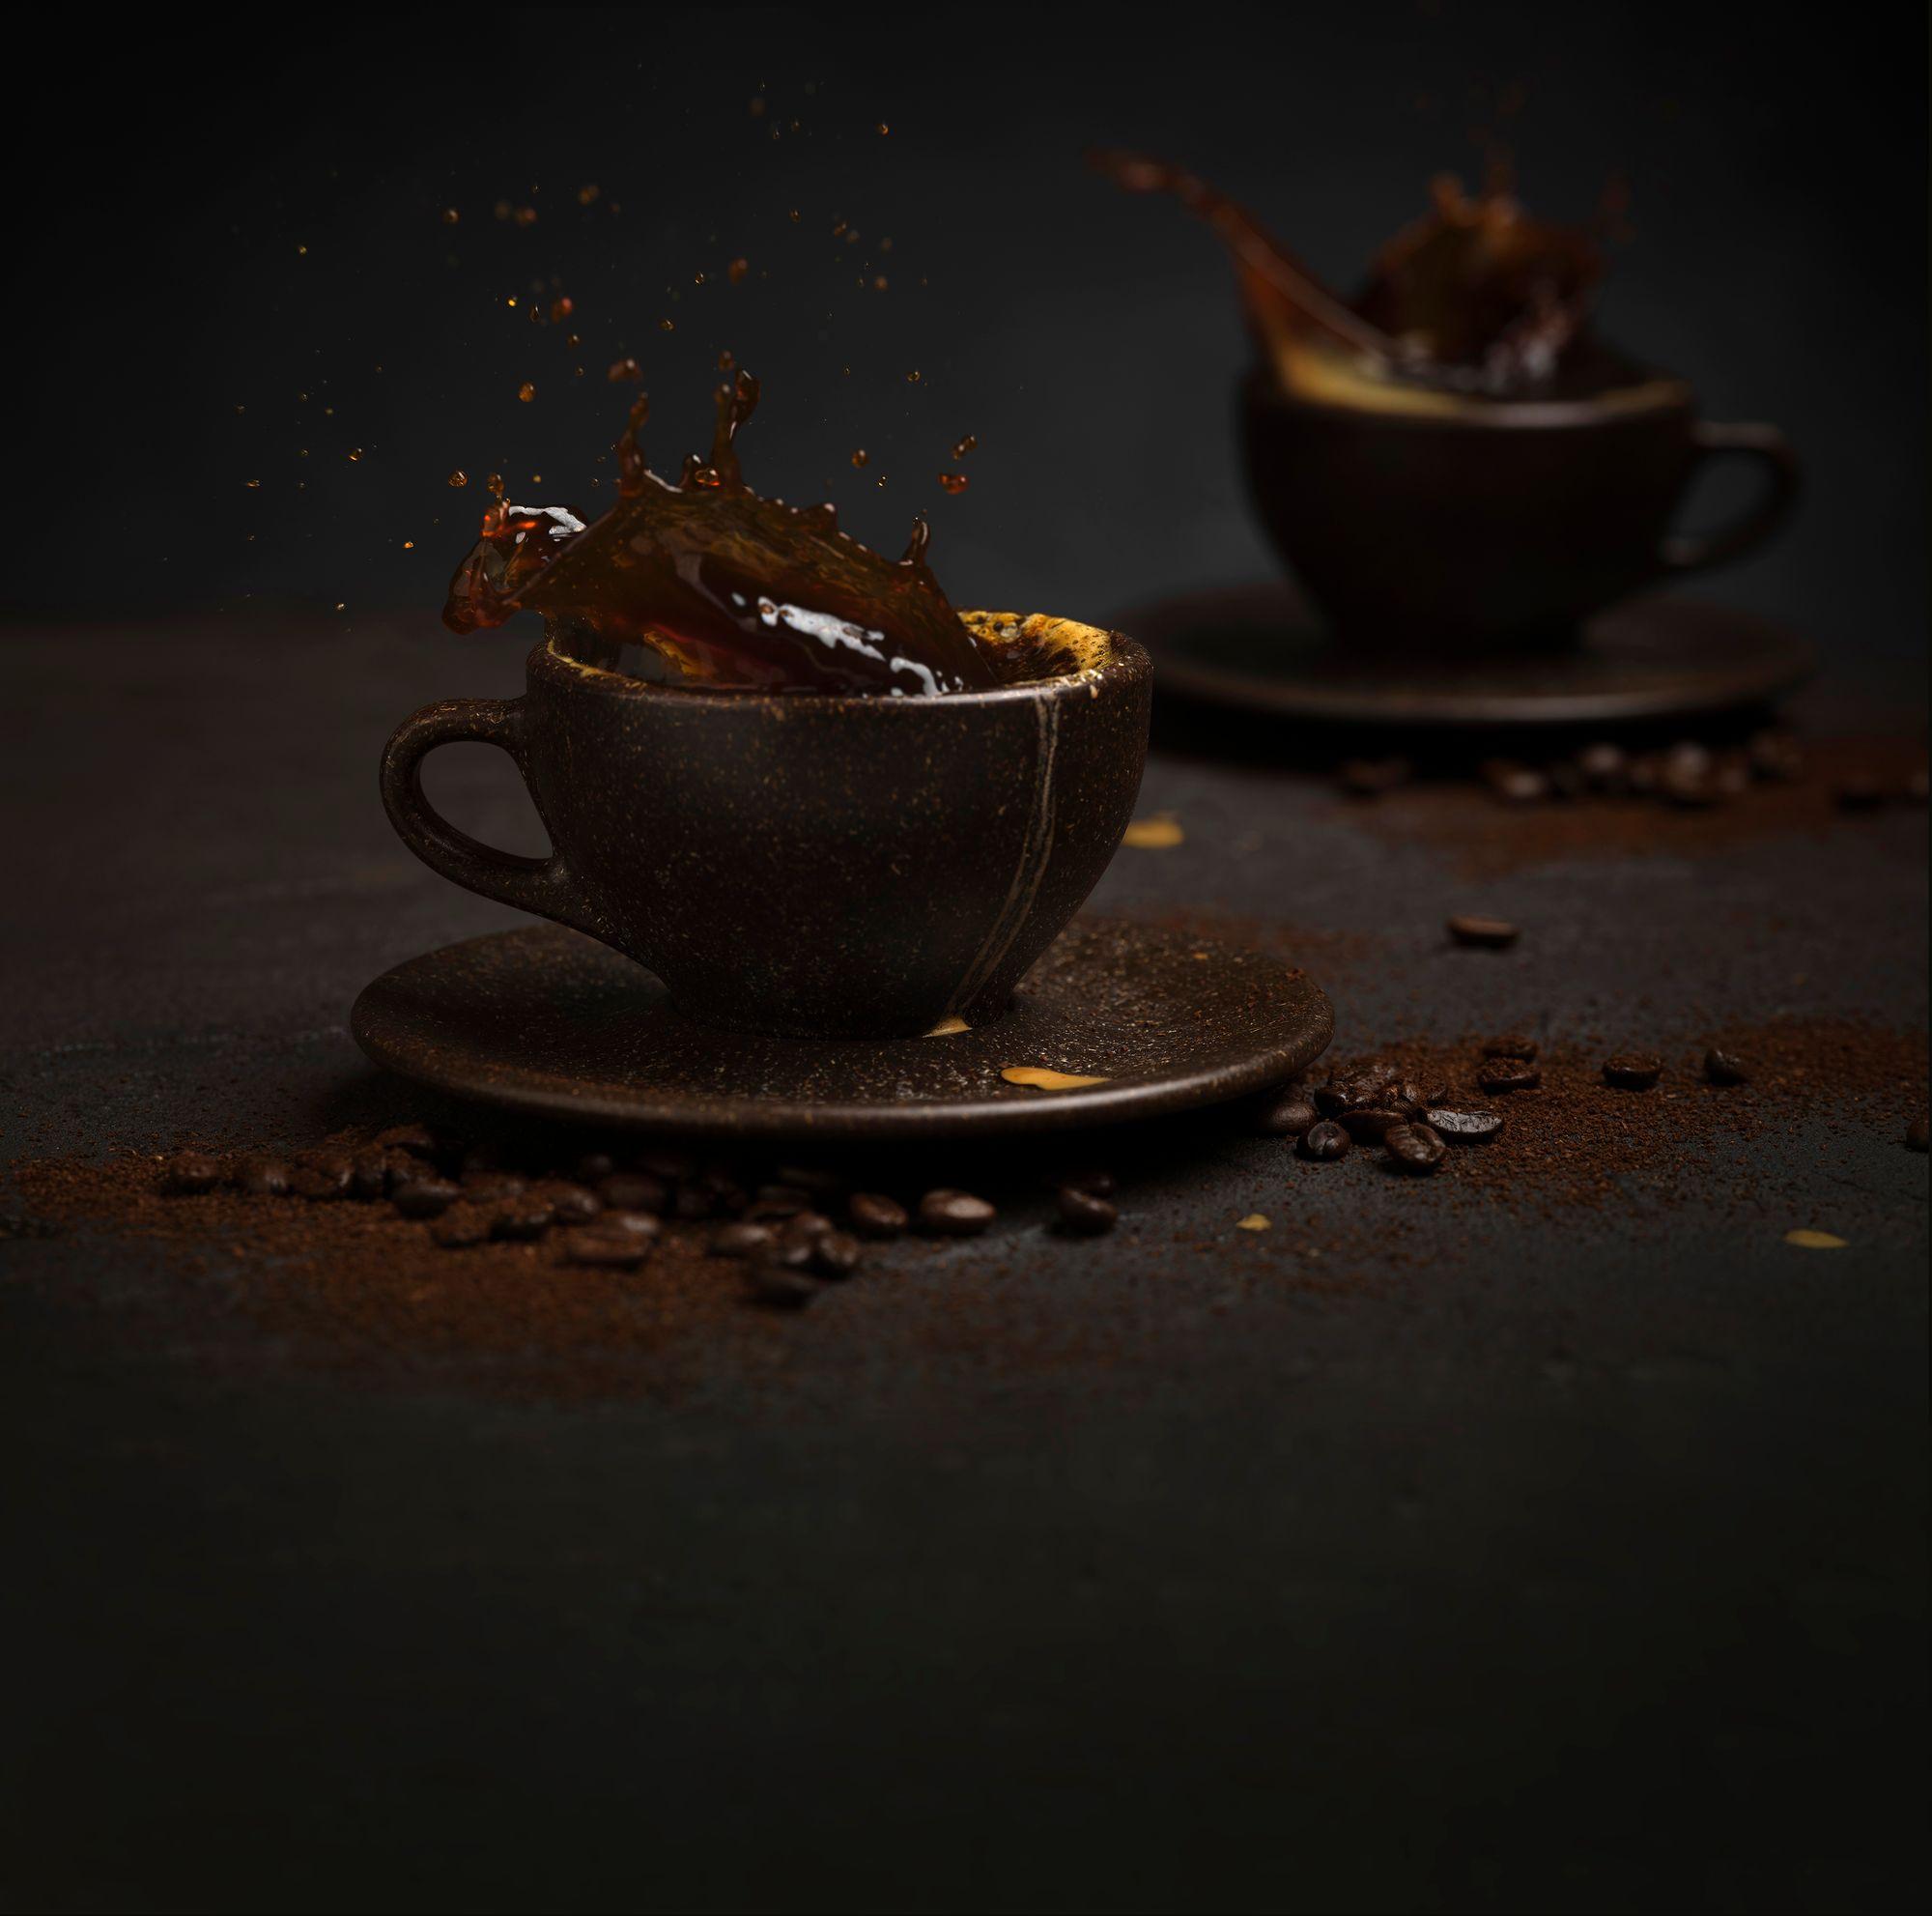 cup of coffee splashing